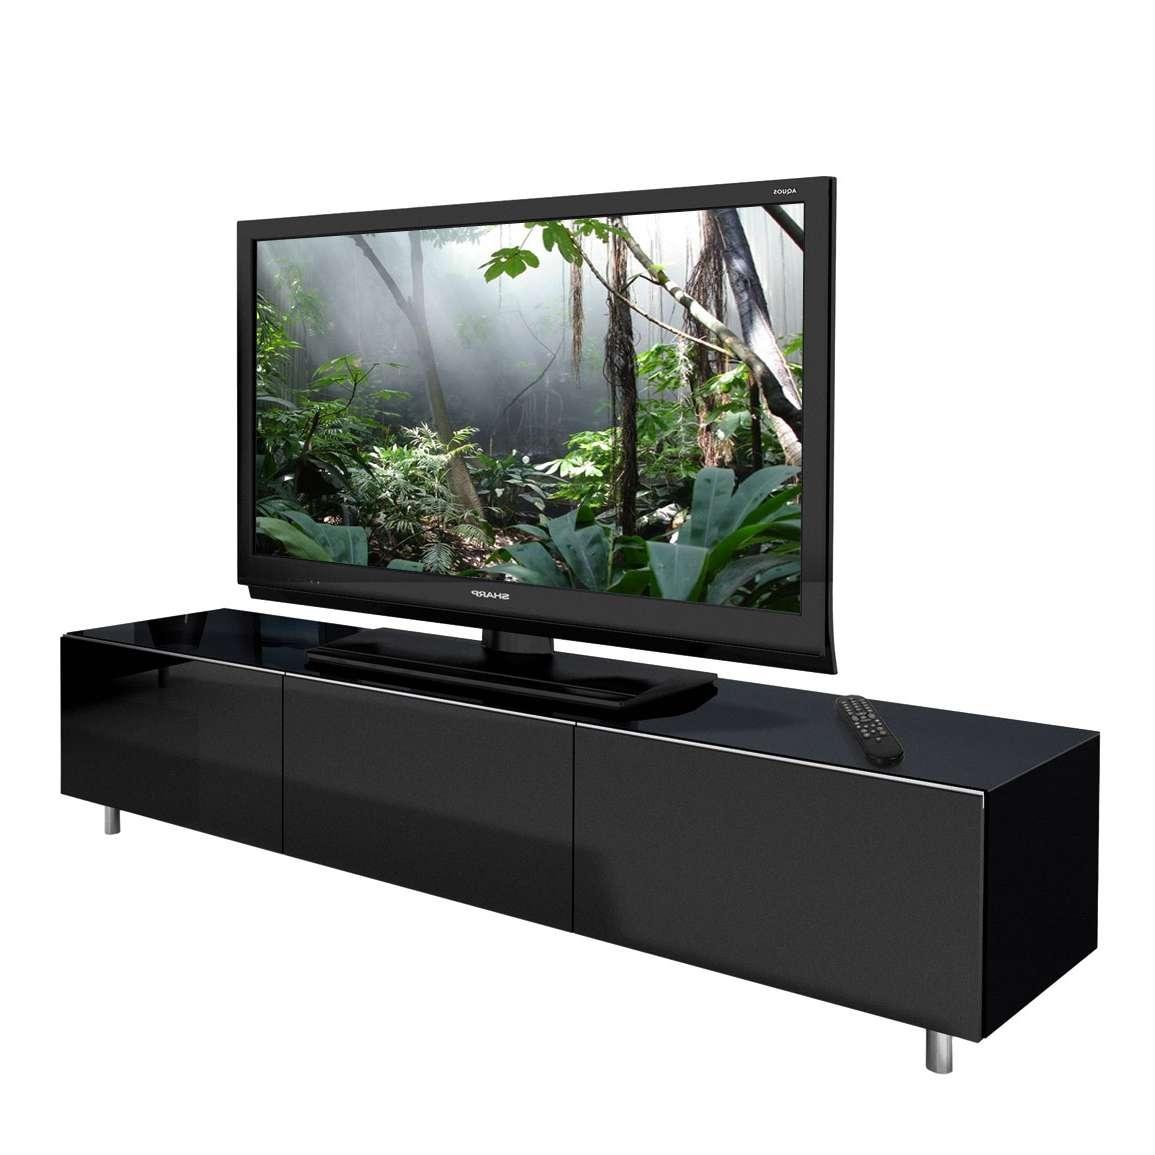 Just Racks Jrl1650 Gloss Black Tv Cabinet – Black Tv Stands Regarding Black Gloss Tv Stands (View 8 of 20)